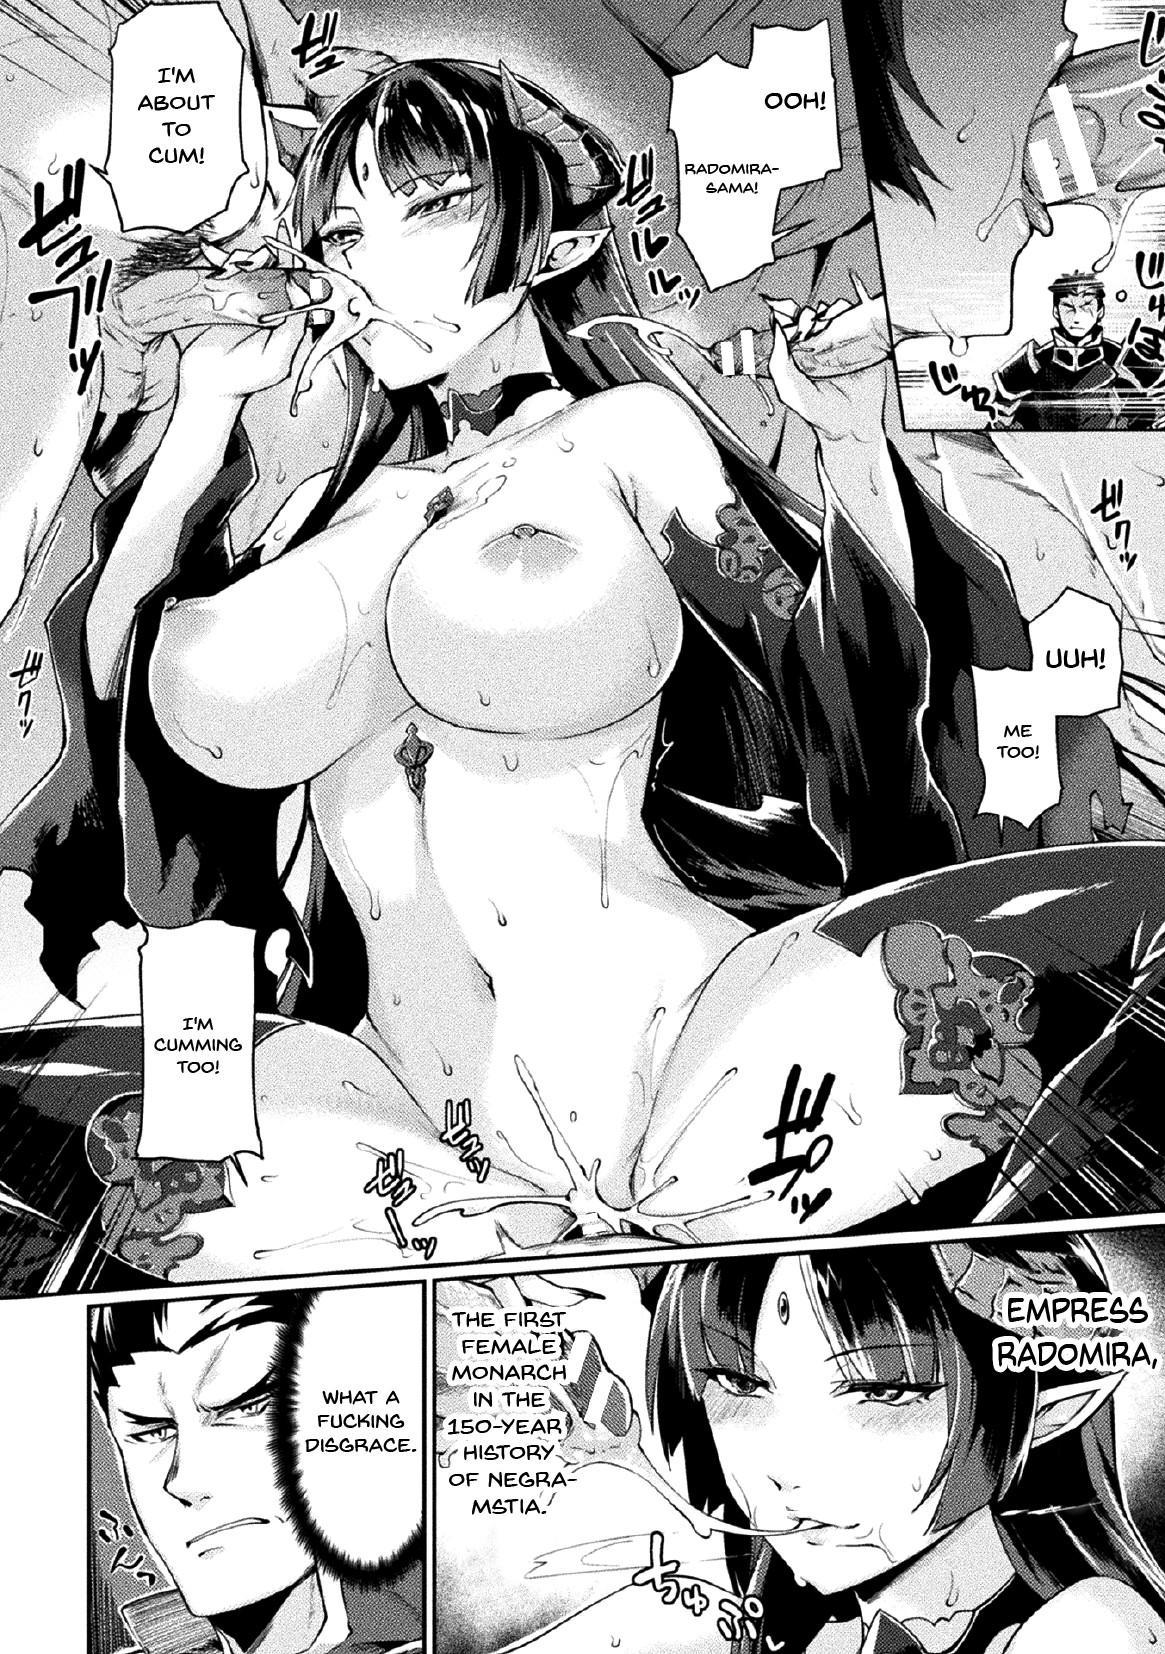 [Tsukitokage] Kuroinu II ~Inyoku ni Somaru Haitoku no Miyako, Futatabi~ THE COMIC   Kuroinu II ~Corrupted Town Stained With Lust~ THE COMIC Ch. 1 (Haiboku Otome Ecstasy Vol. 17) [English] {Doujins.com} [Digital] 5